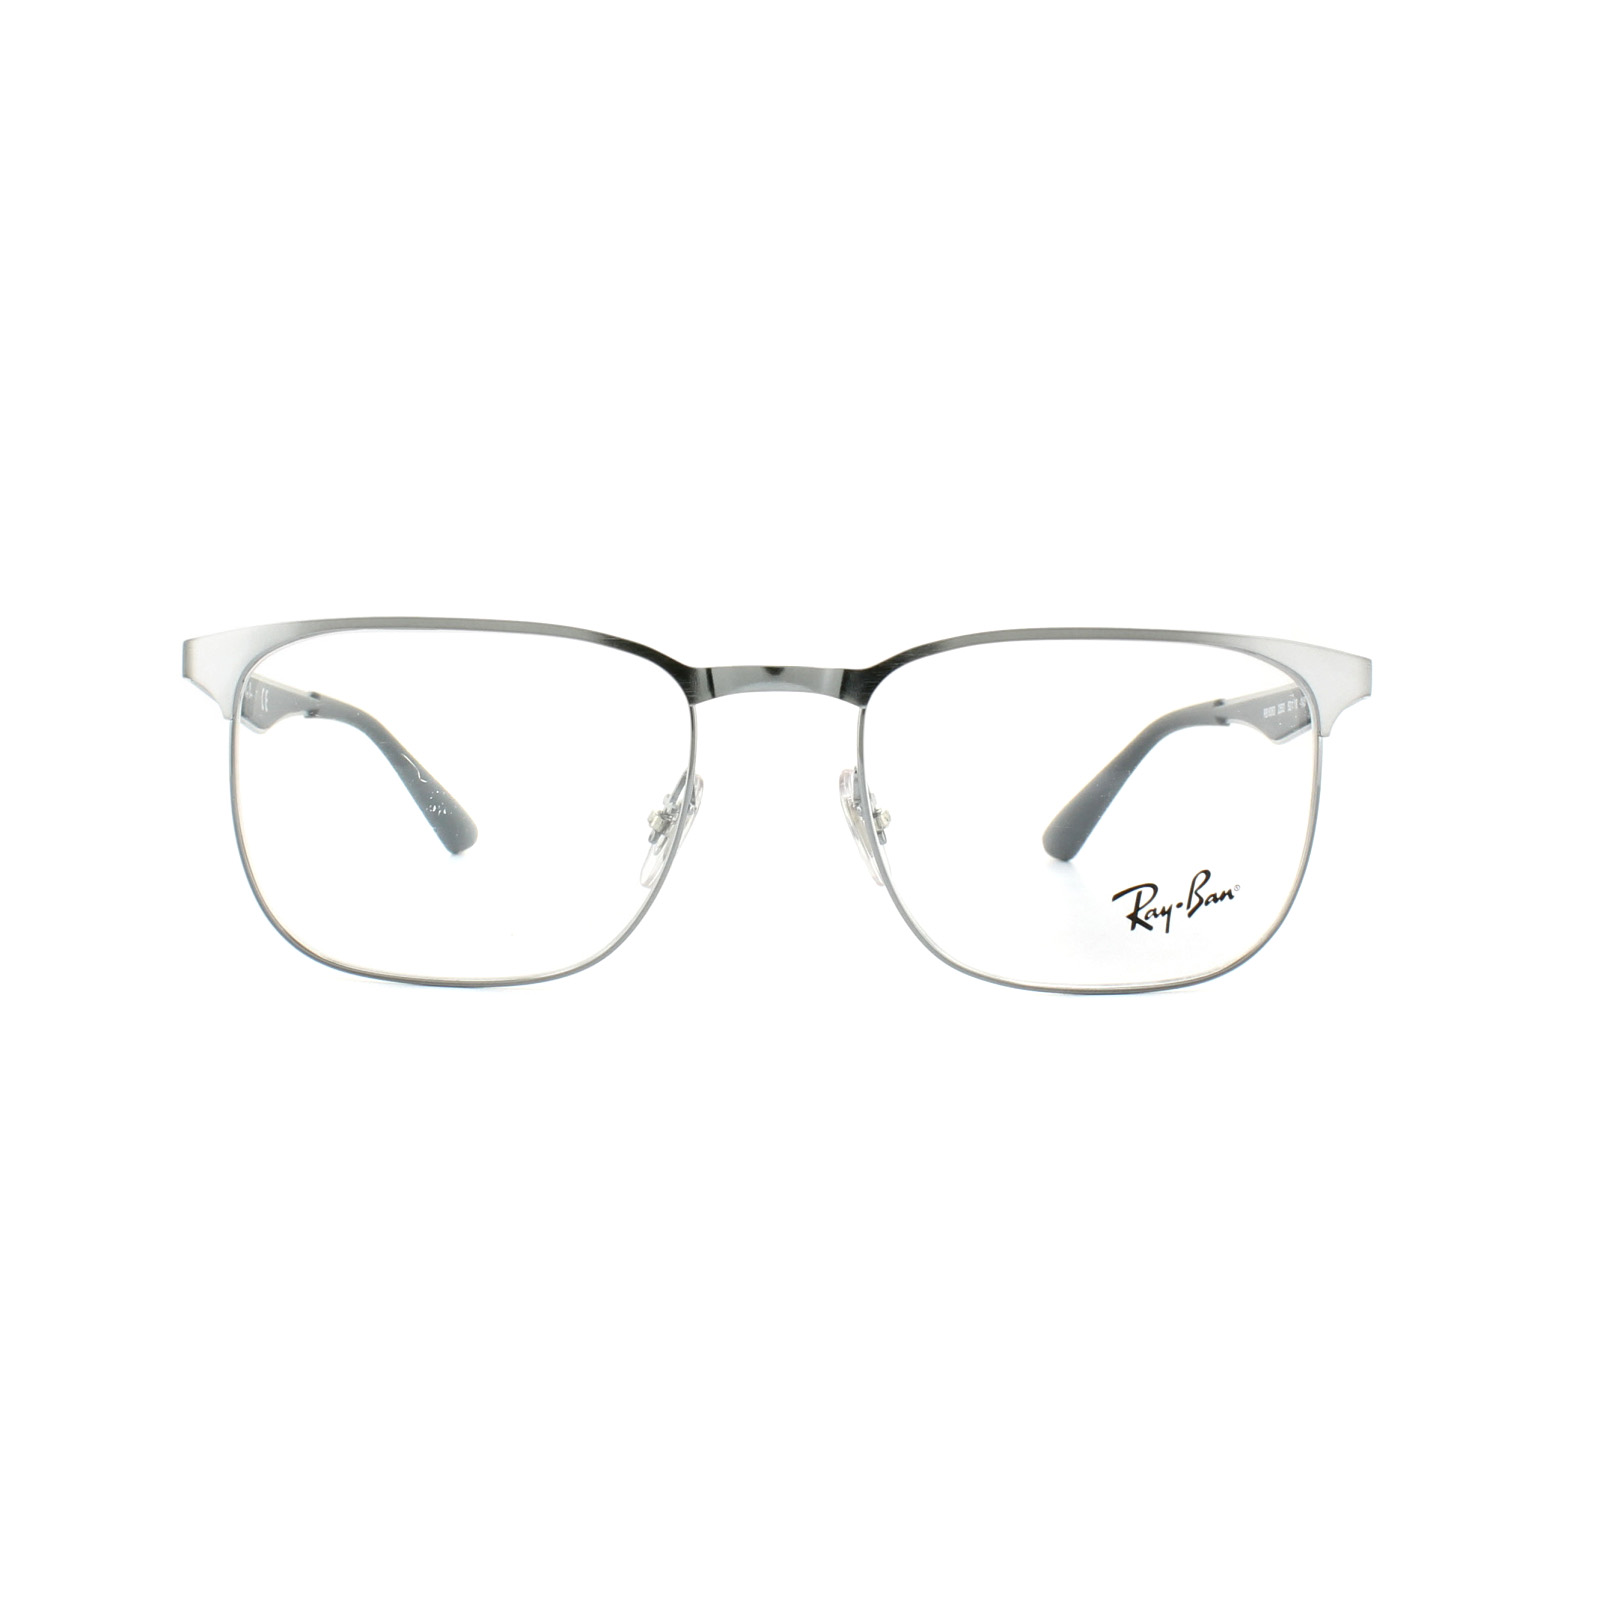 Ray-Ban Glasses Frames 6363 2553 Gunmetal 54mm Mens Womens ...